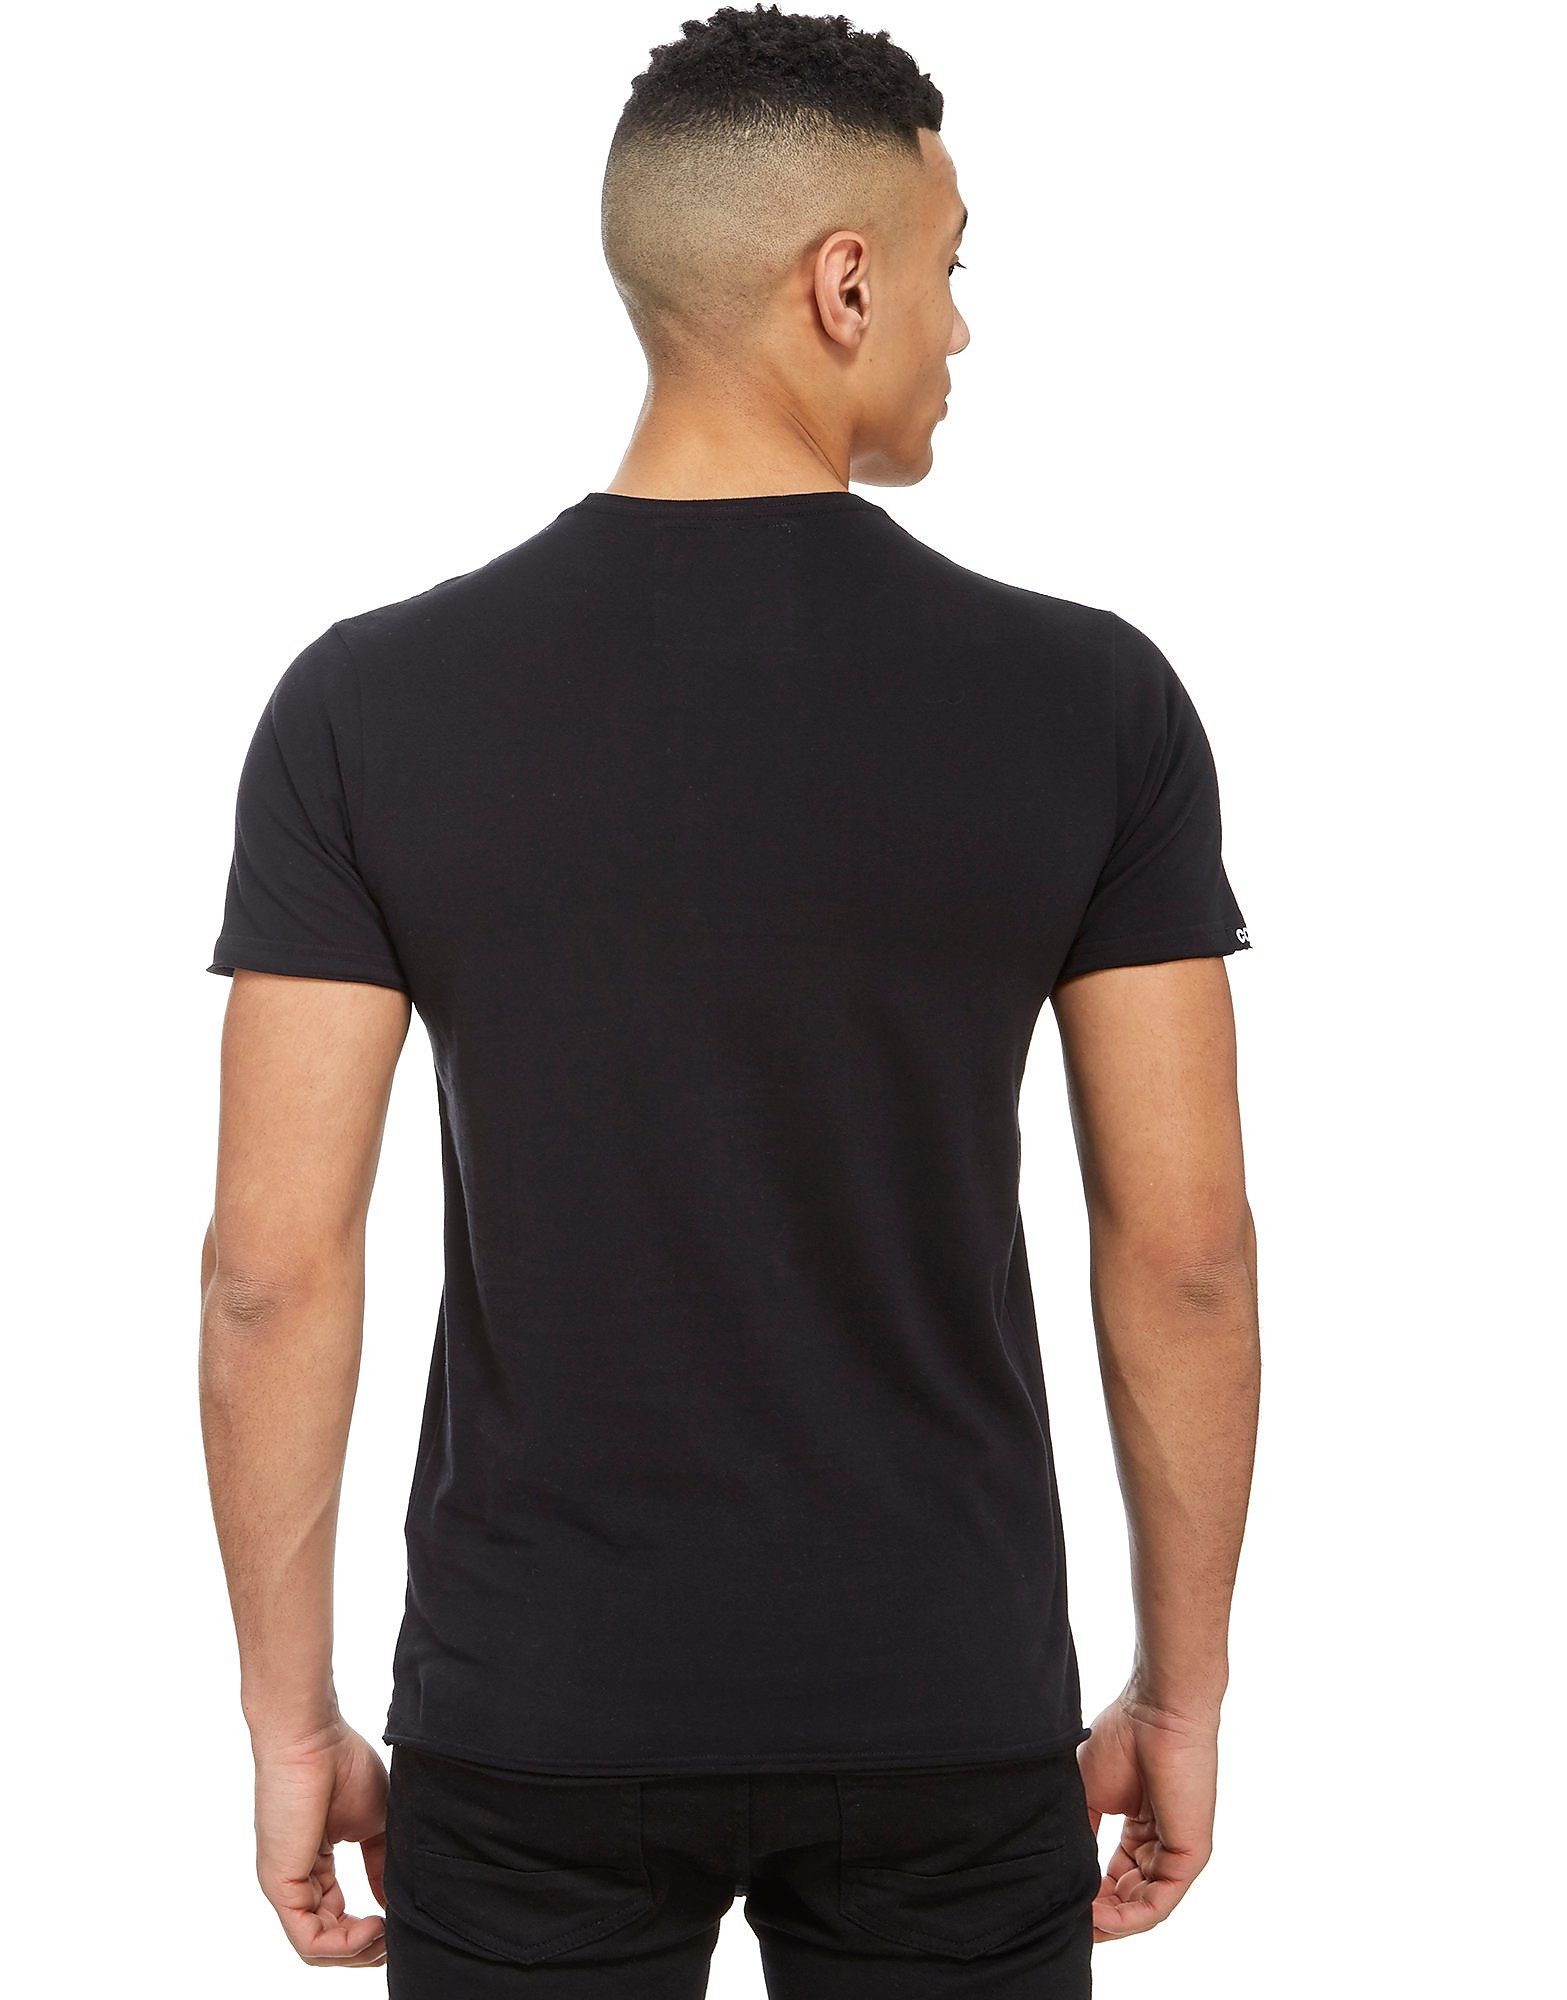 COPA George Best United T-Shirt